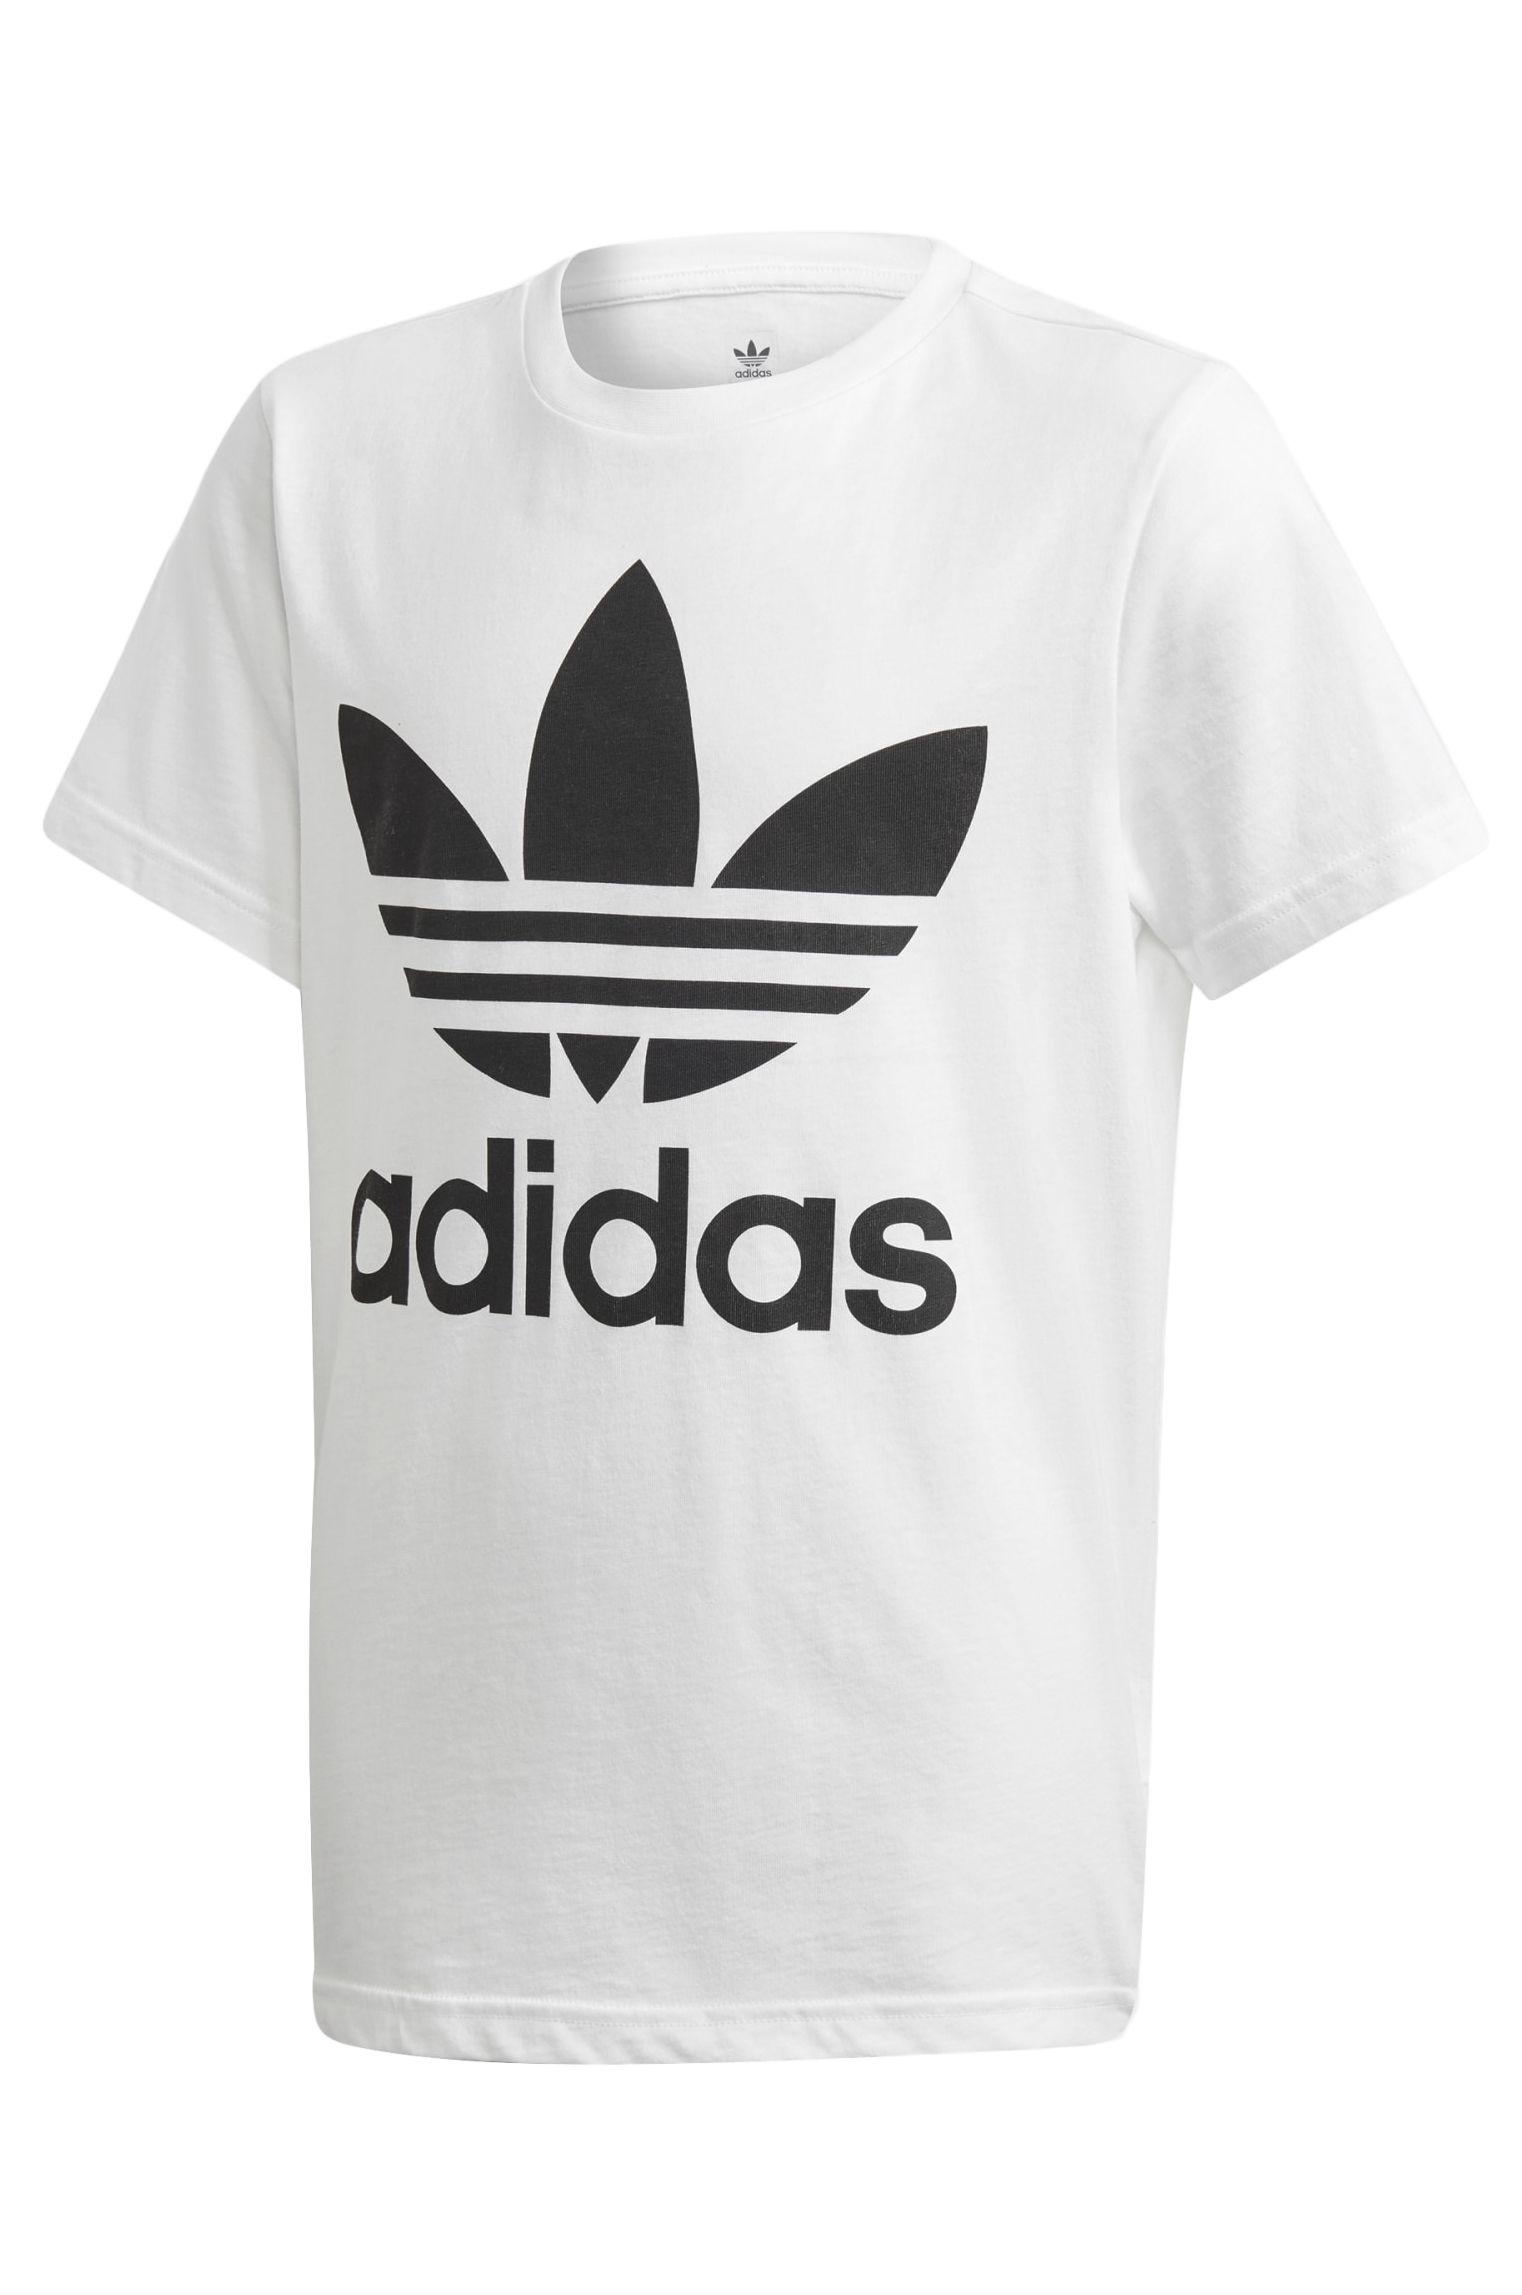 T-Shirt Adidas TREFOIL TEE White/Black